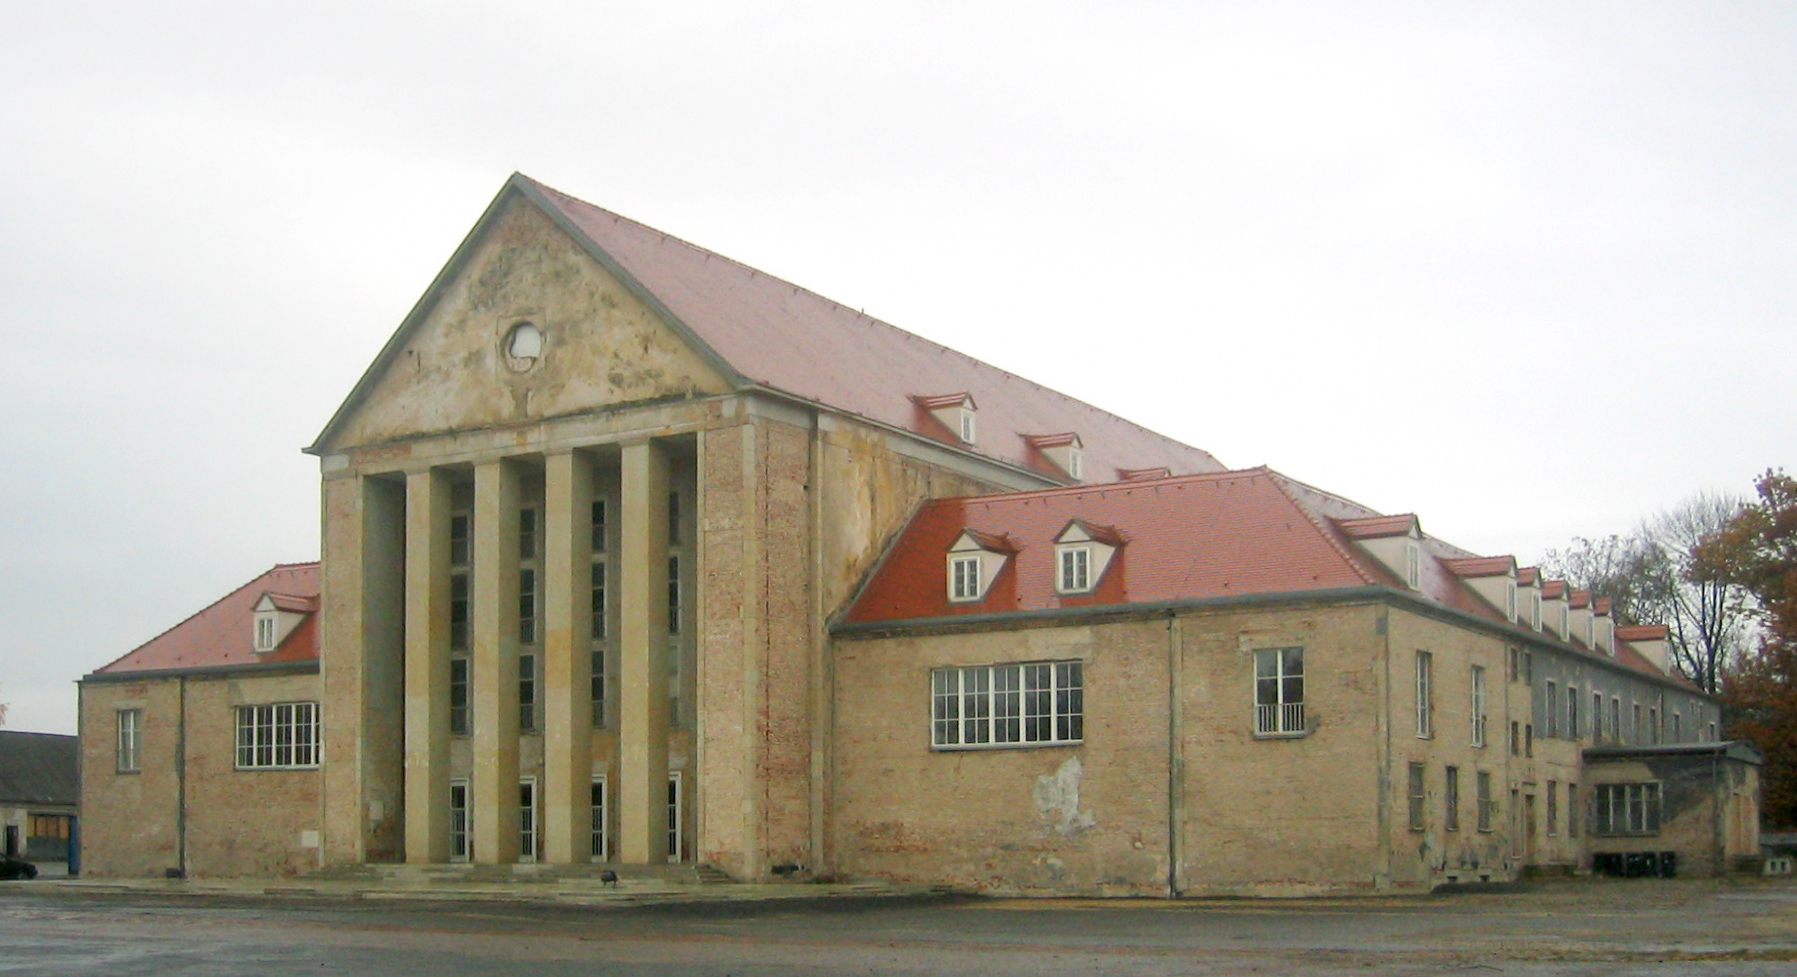 Festspielhaus Hellerau (2003)